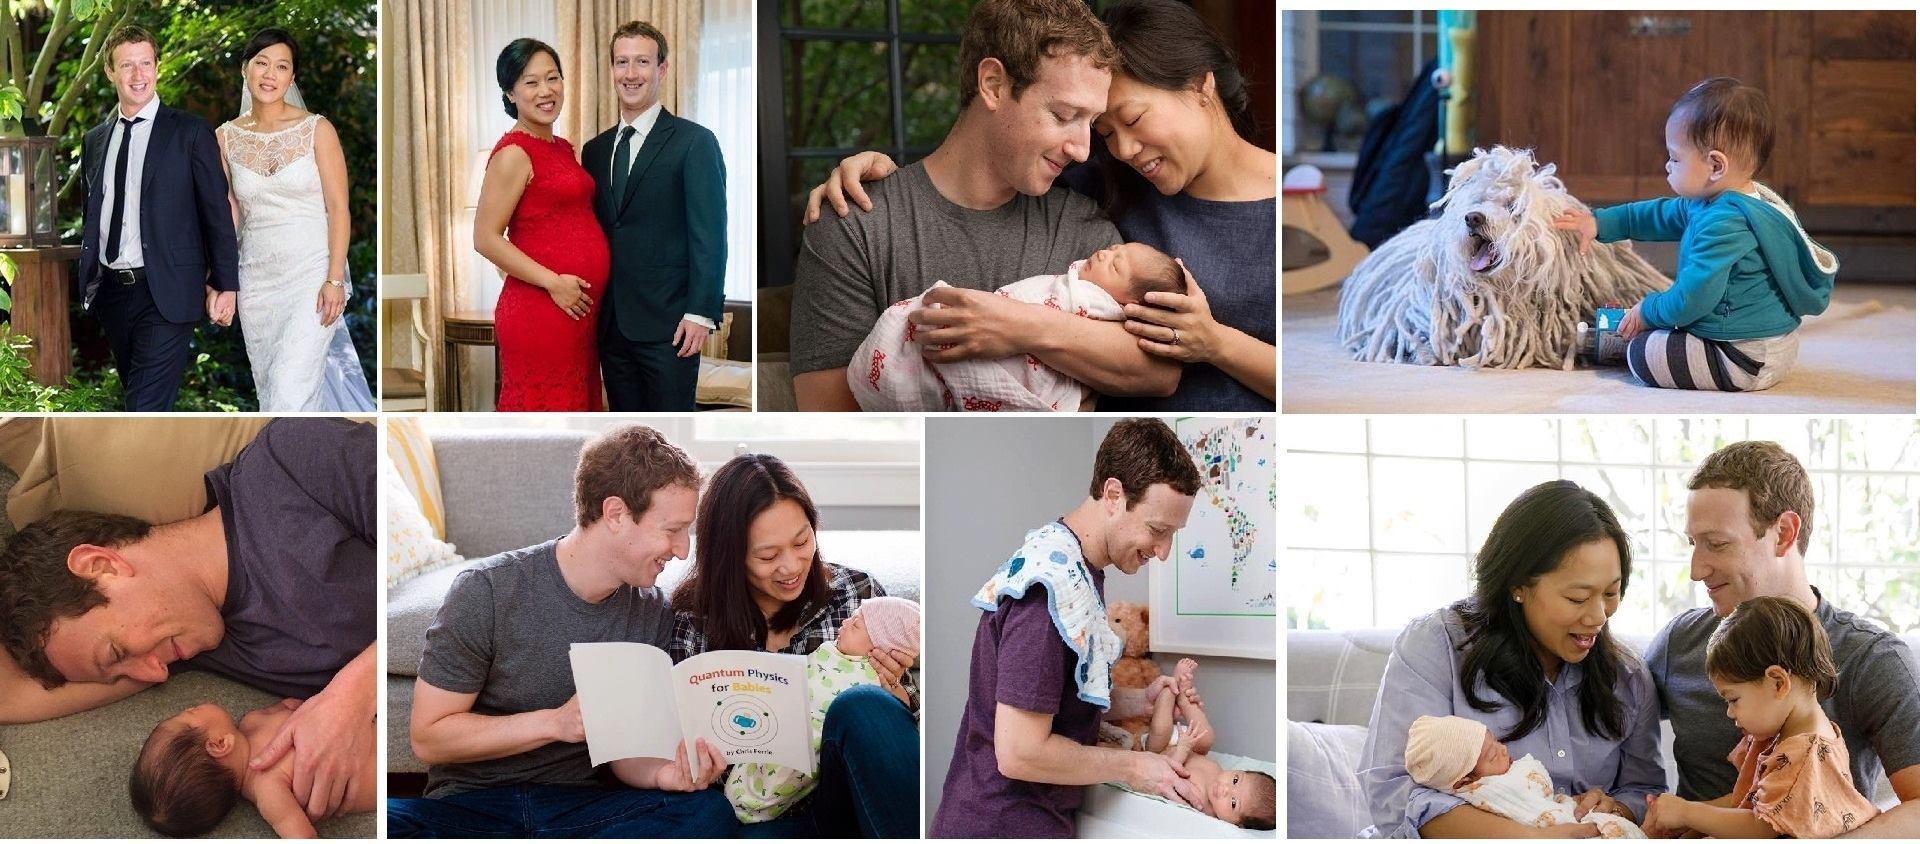 Mark Zuckerberg, ikinci kez baba oldu